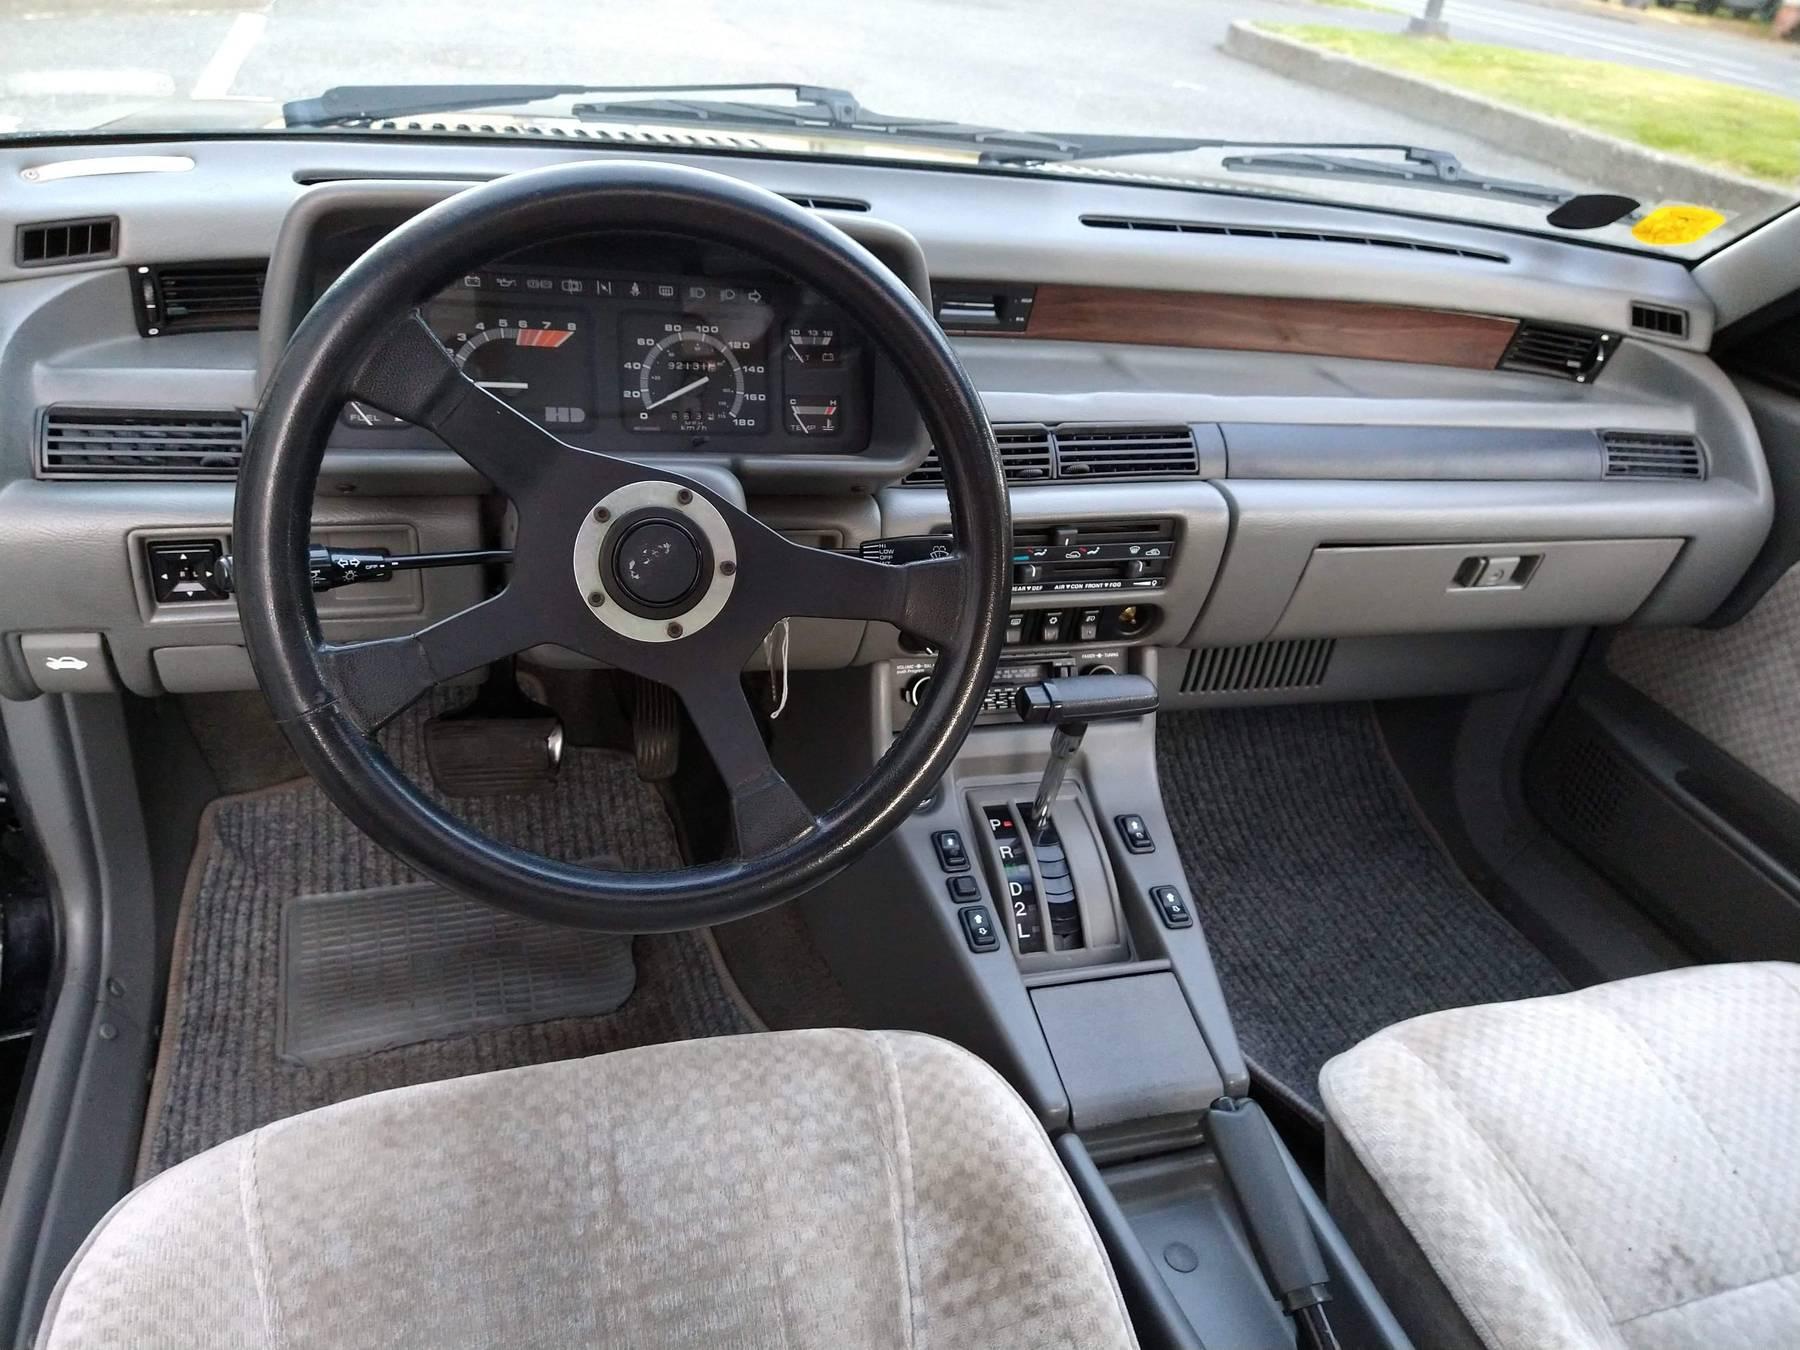 1986 Hyundai Stellar Executive interior